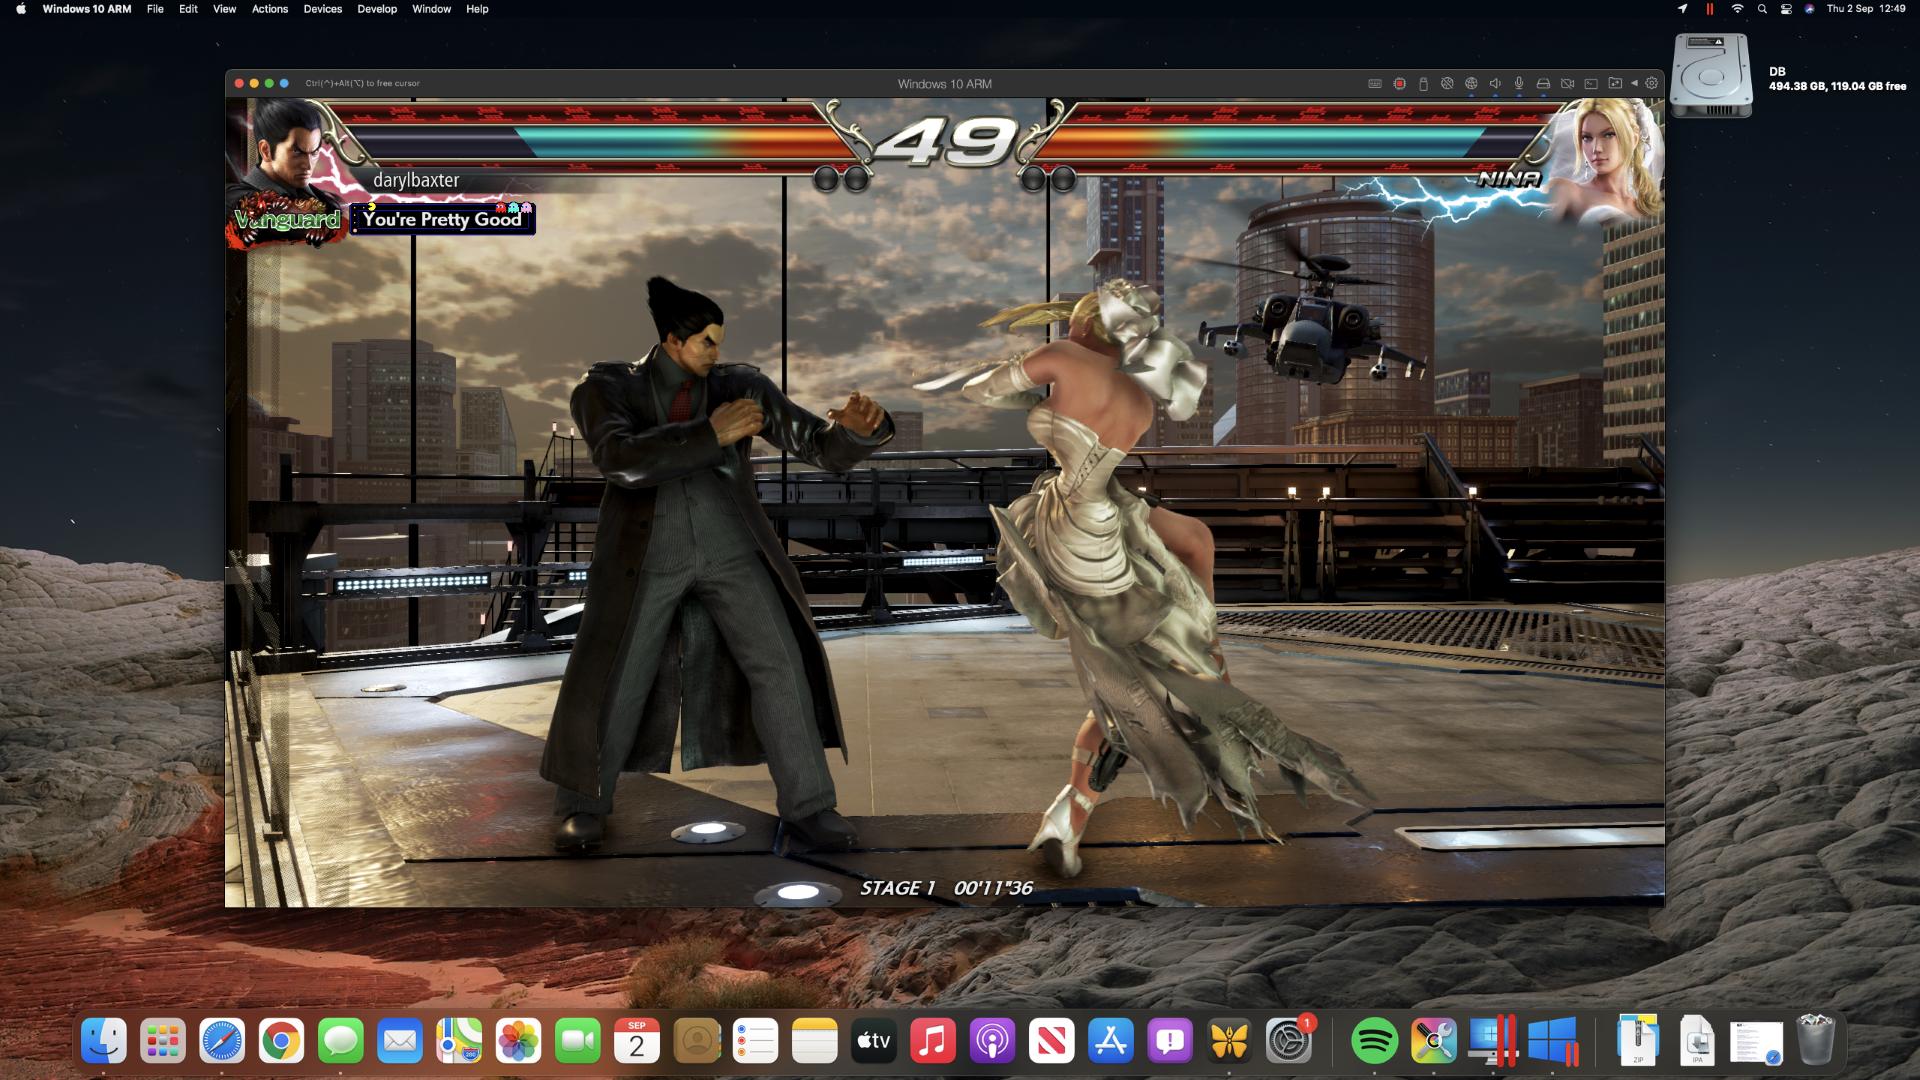 Tekken 7 on an M1 Mac mini through Steam